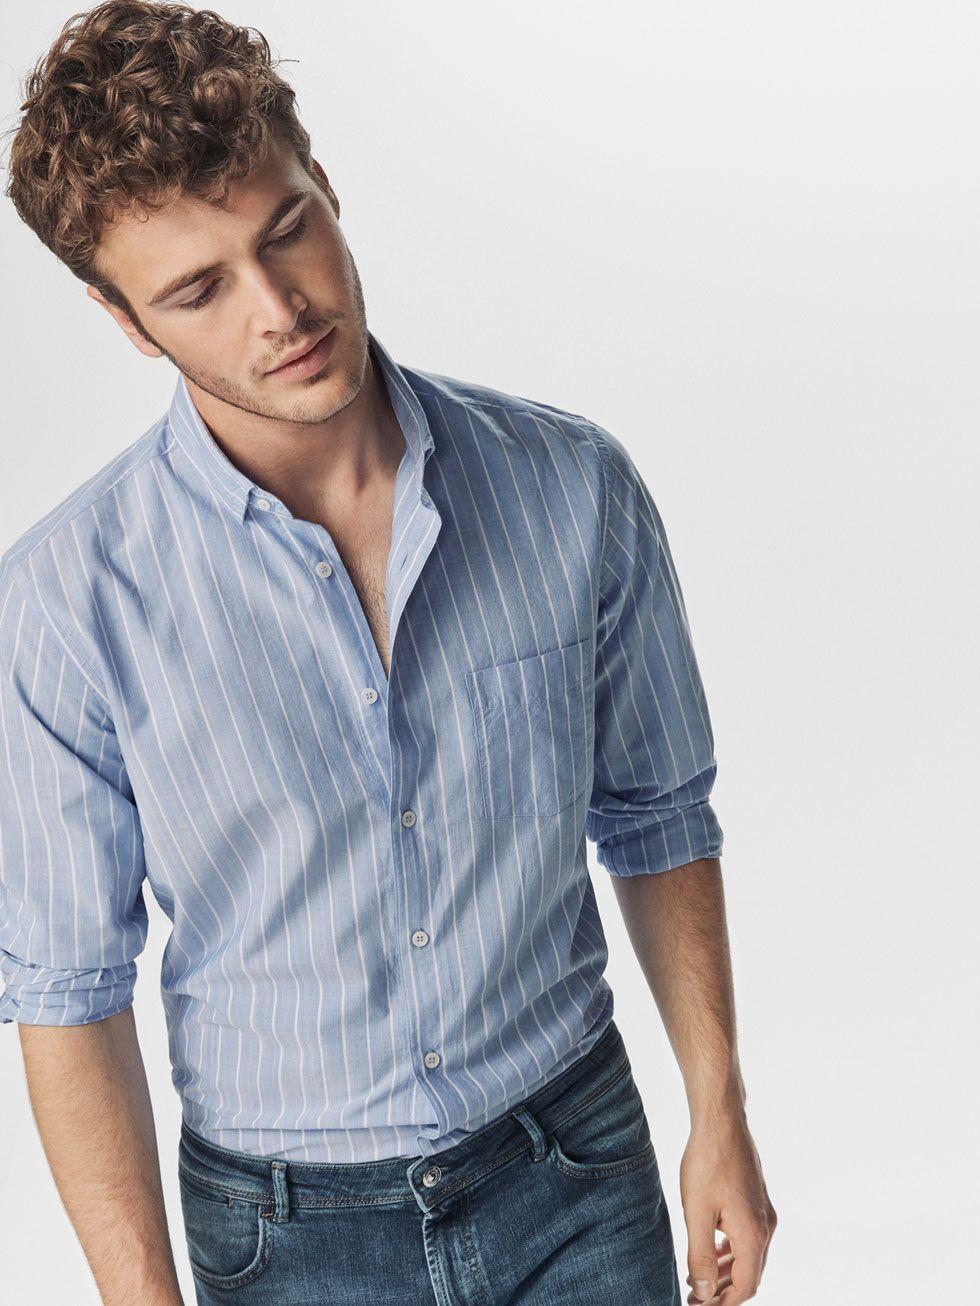 a42aefc027ebc CAMISA CELESTE DISEÑO RAYAS BLANCAS CASUAL de HOMBRE - Camisas Casual - Ver  todo de Massimo Dutti de Primavera Verano 2017 por 39.95. ¡Elegancia  natural!